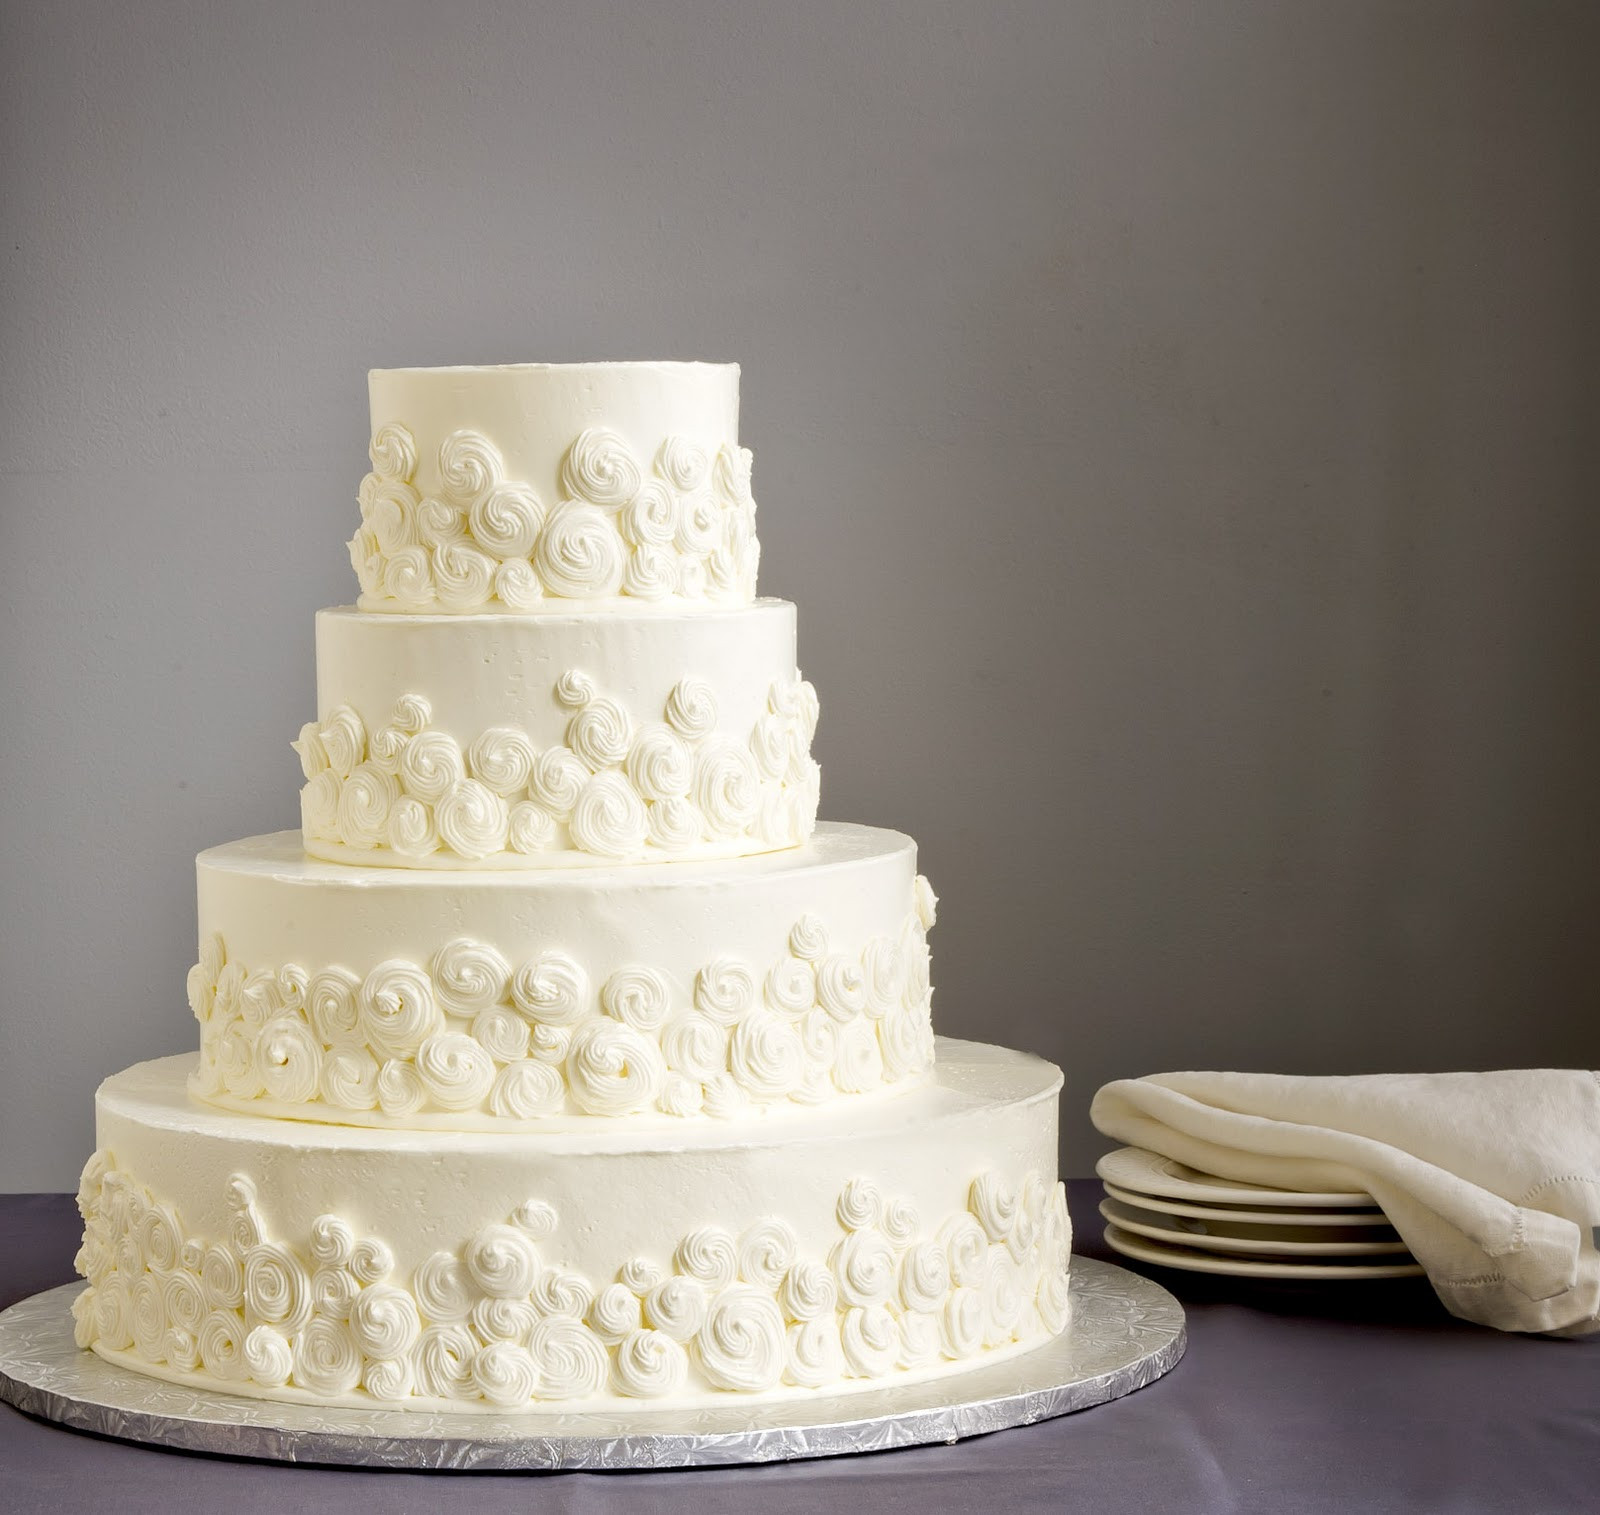 Simple Wedding Cakes Design  A Simple Cake THREE NEW Wedding Cake Ideas